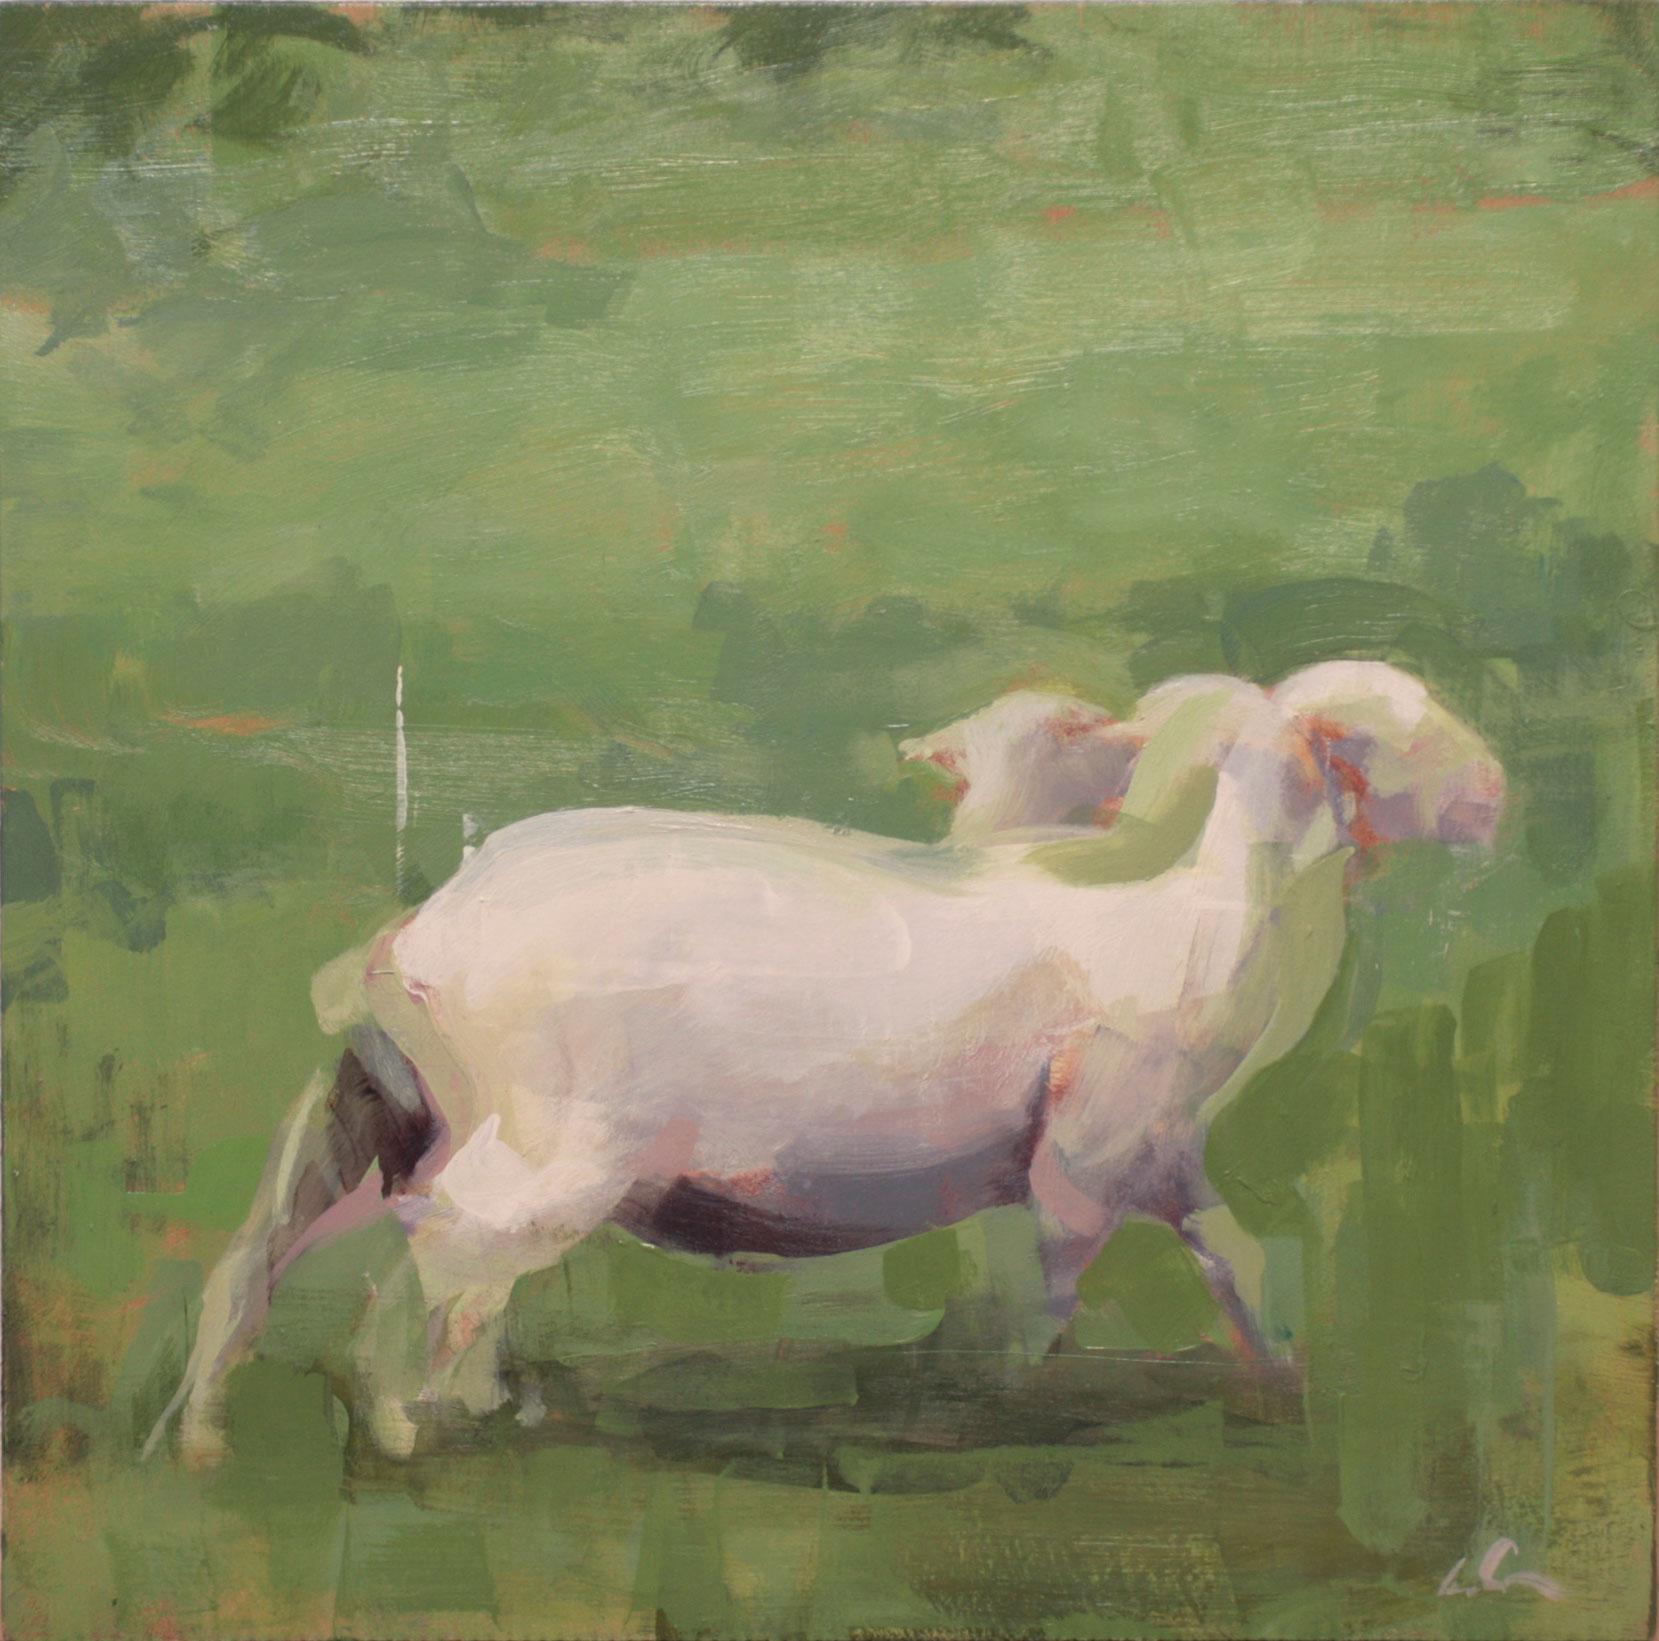 mark-crenshaw-1405-one-sheep-walking.jpg